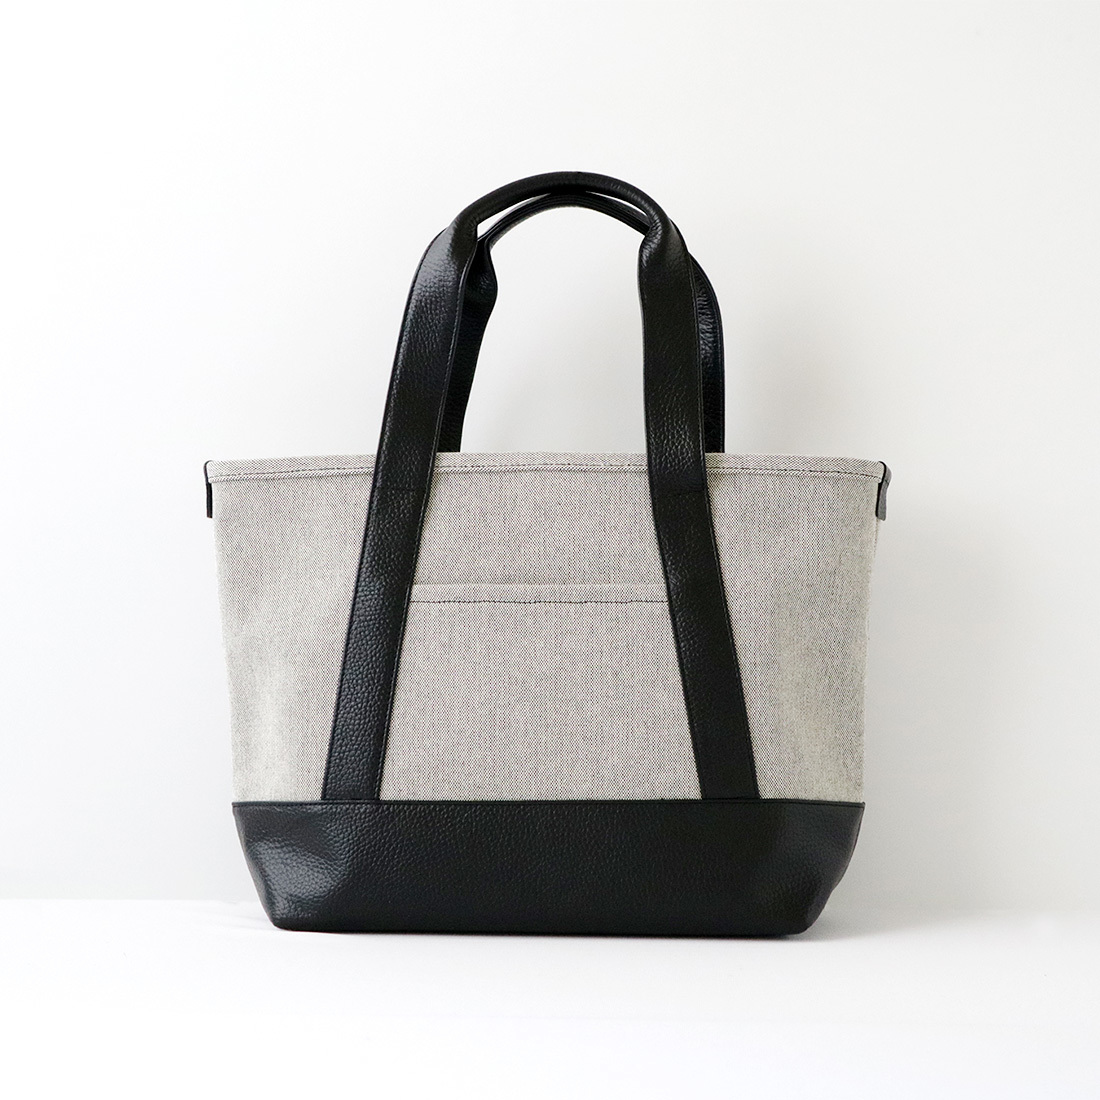 【MOHEIM】 TOTE BAG (Sサイズ / グレイシャンブレー) トートバッグ カバン 鞄 バッグ 手提げ 帆布 ユニセックス